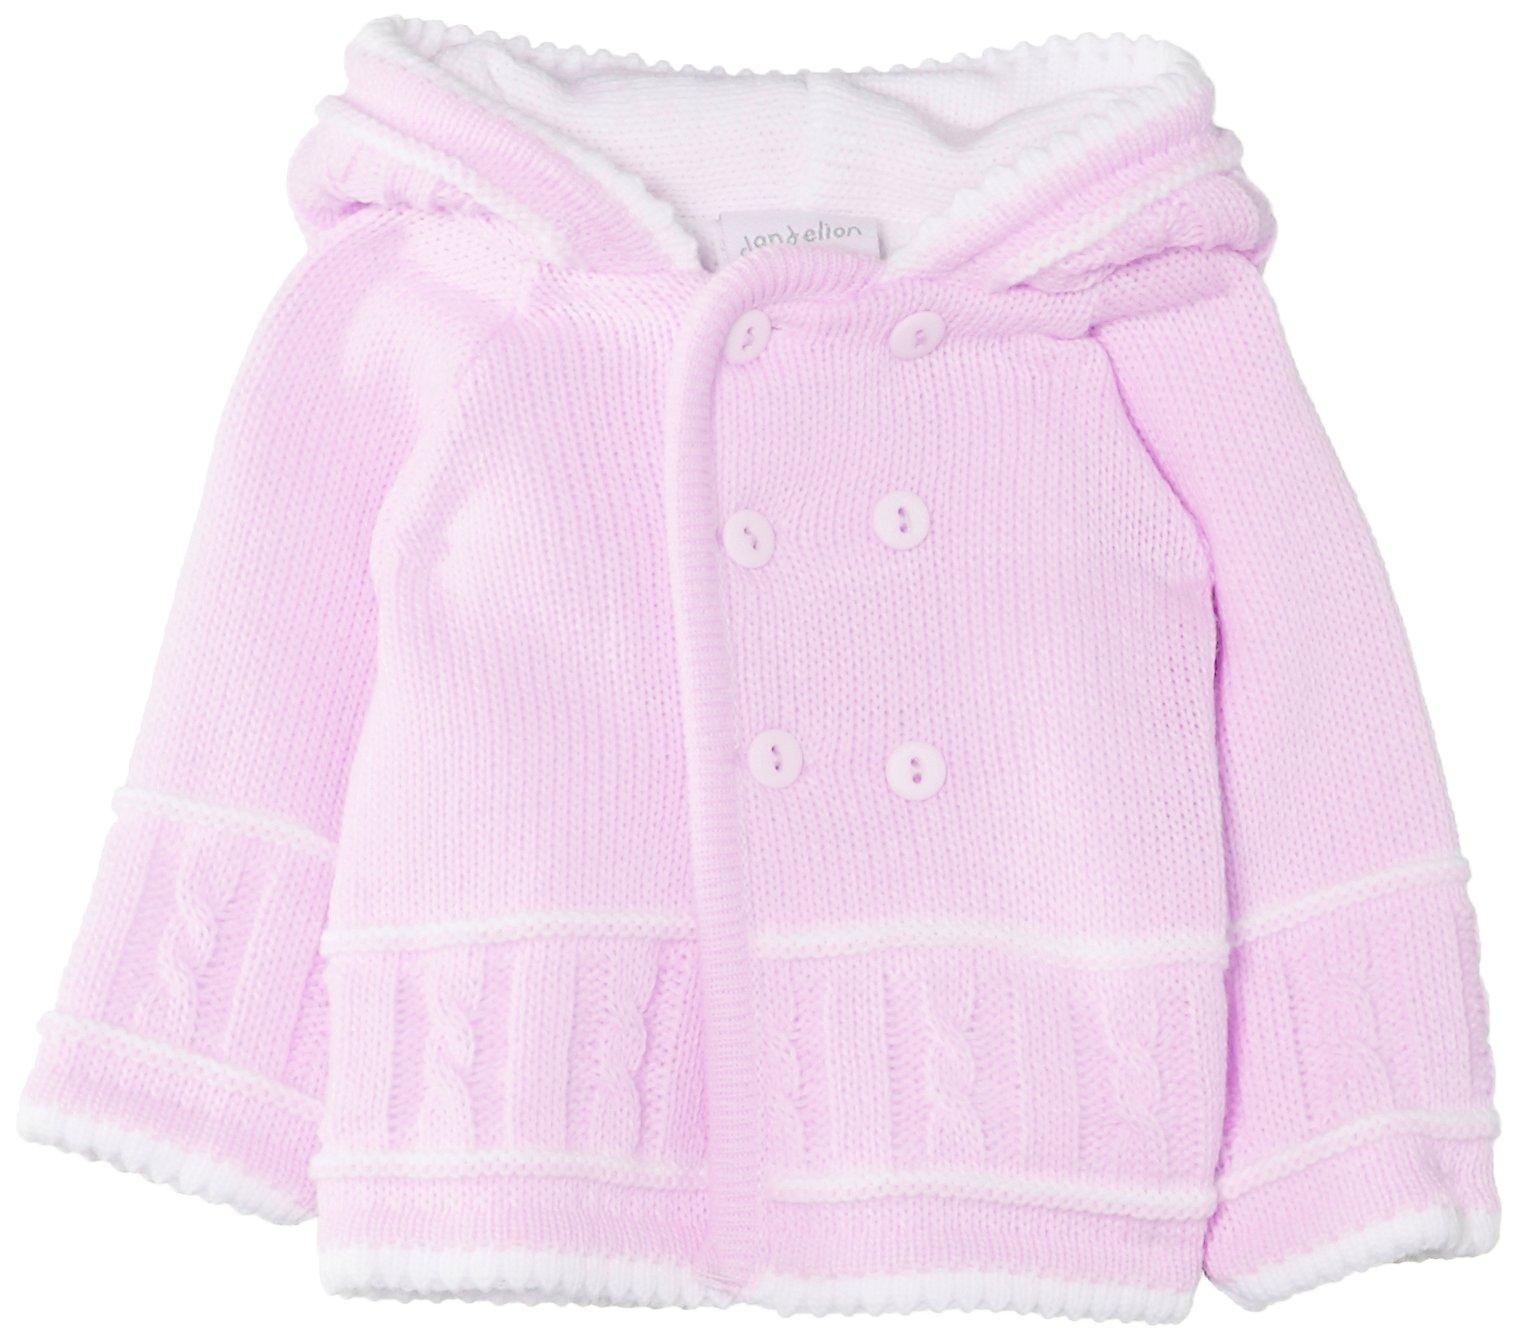 Dandelion Clothing Chaqueta para Bebés 1